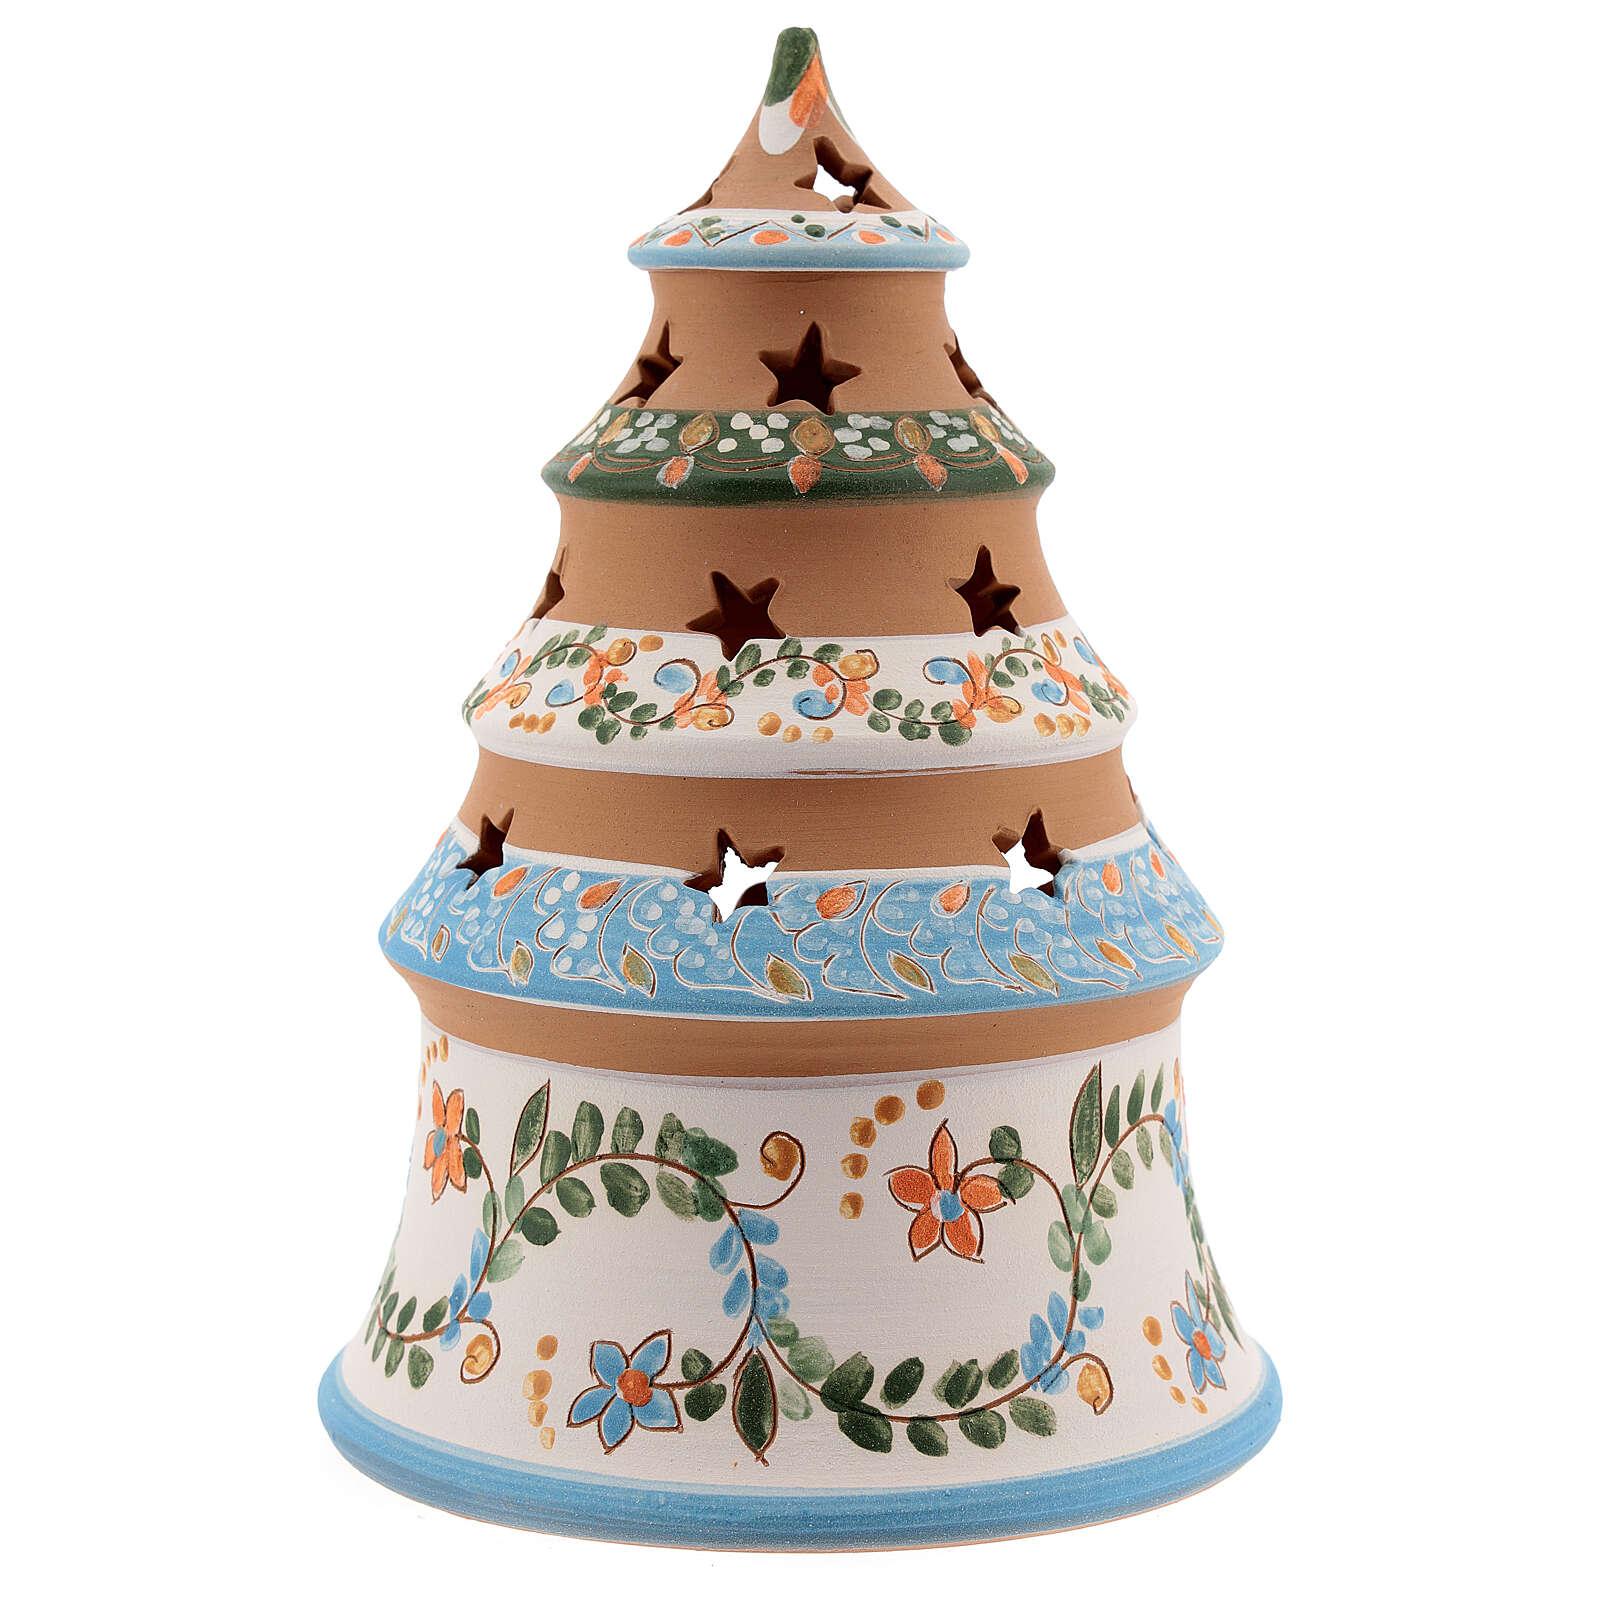 Albero terracotta Sacra famiglia lumino Deruta 20 cm celeste 4